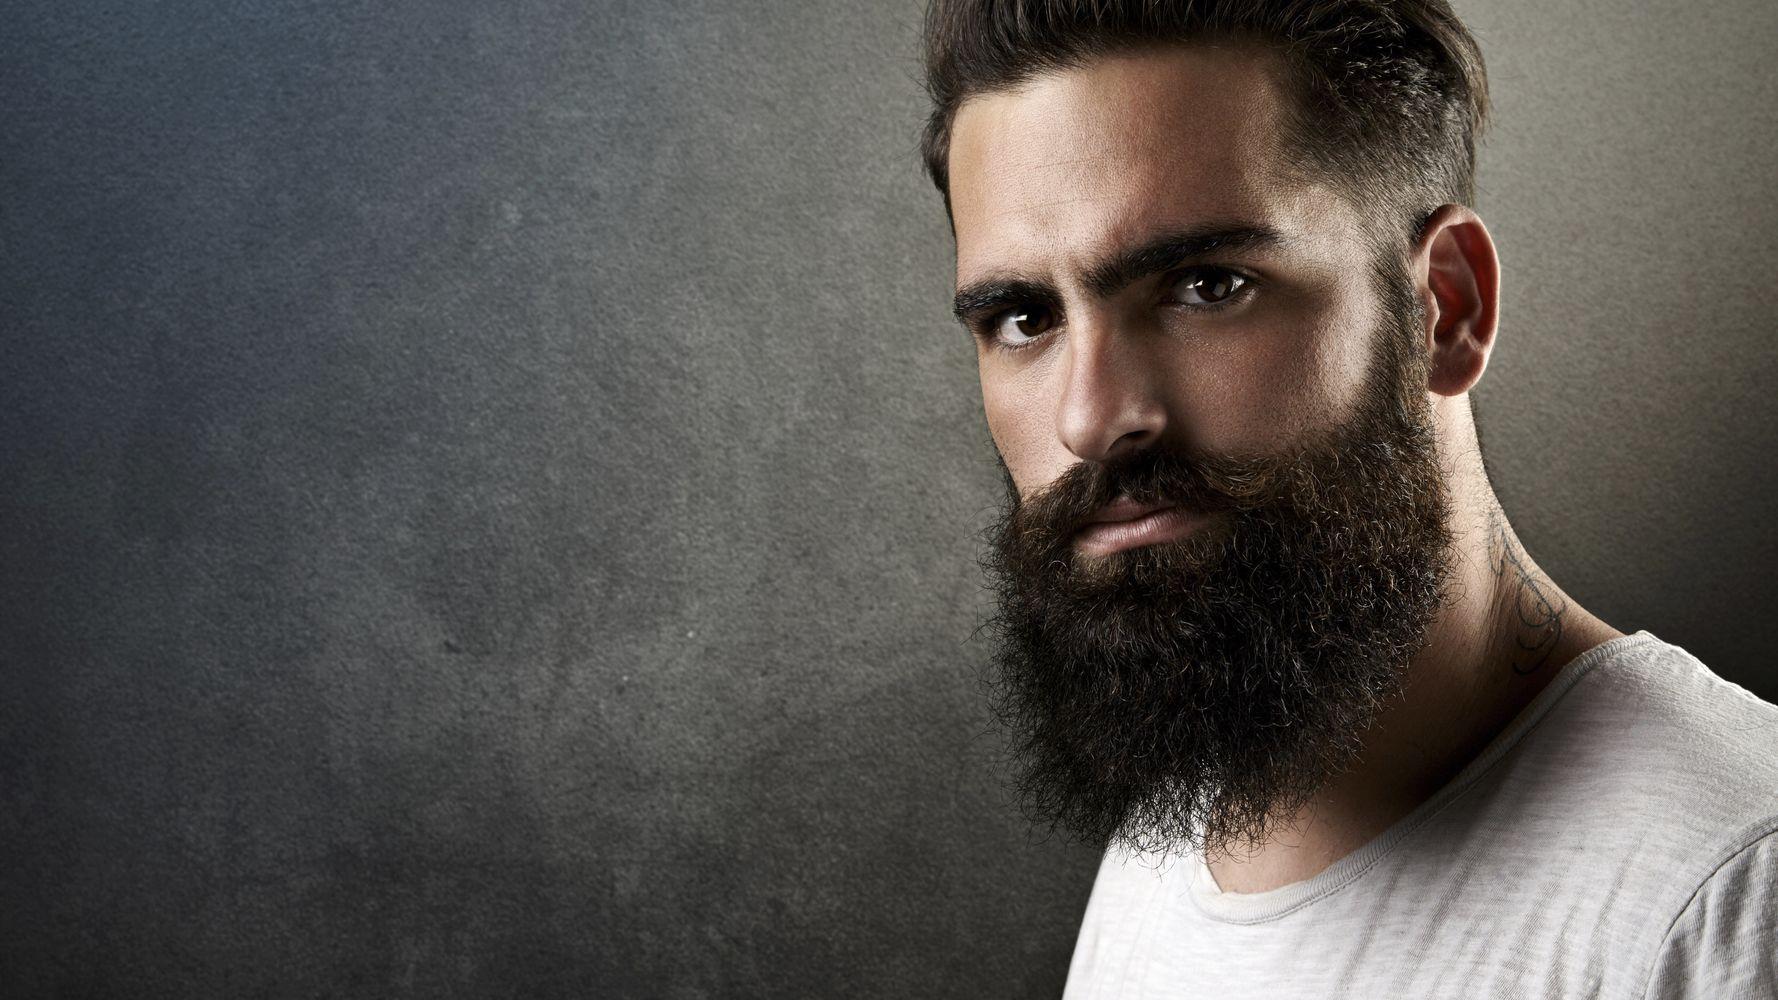 Expert Explains Why A Beard Is Technically Pubic Hair On Your Face ...